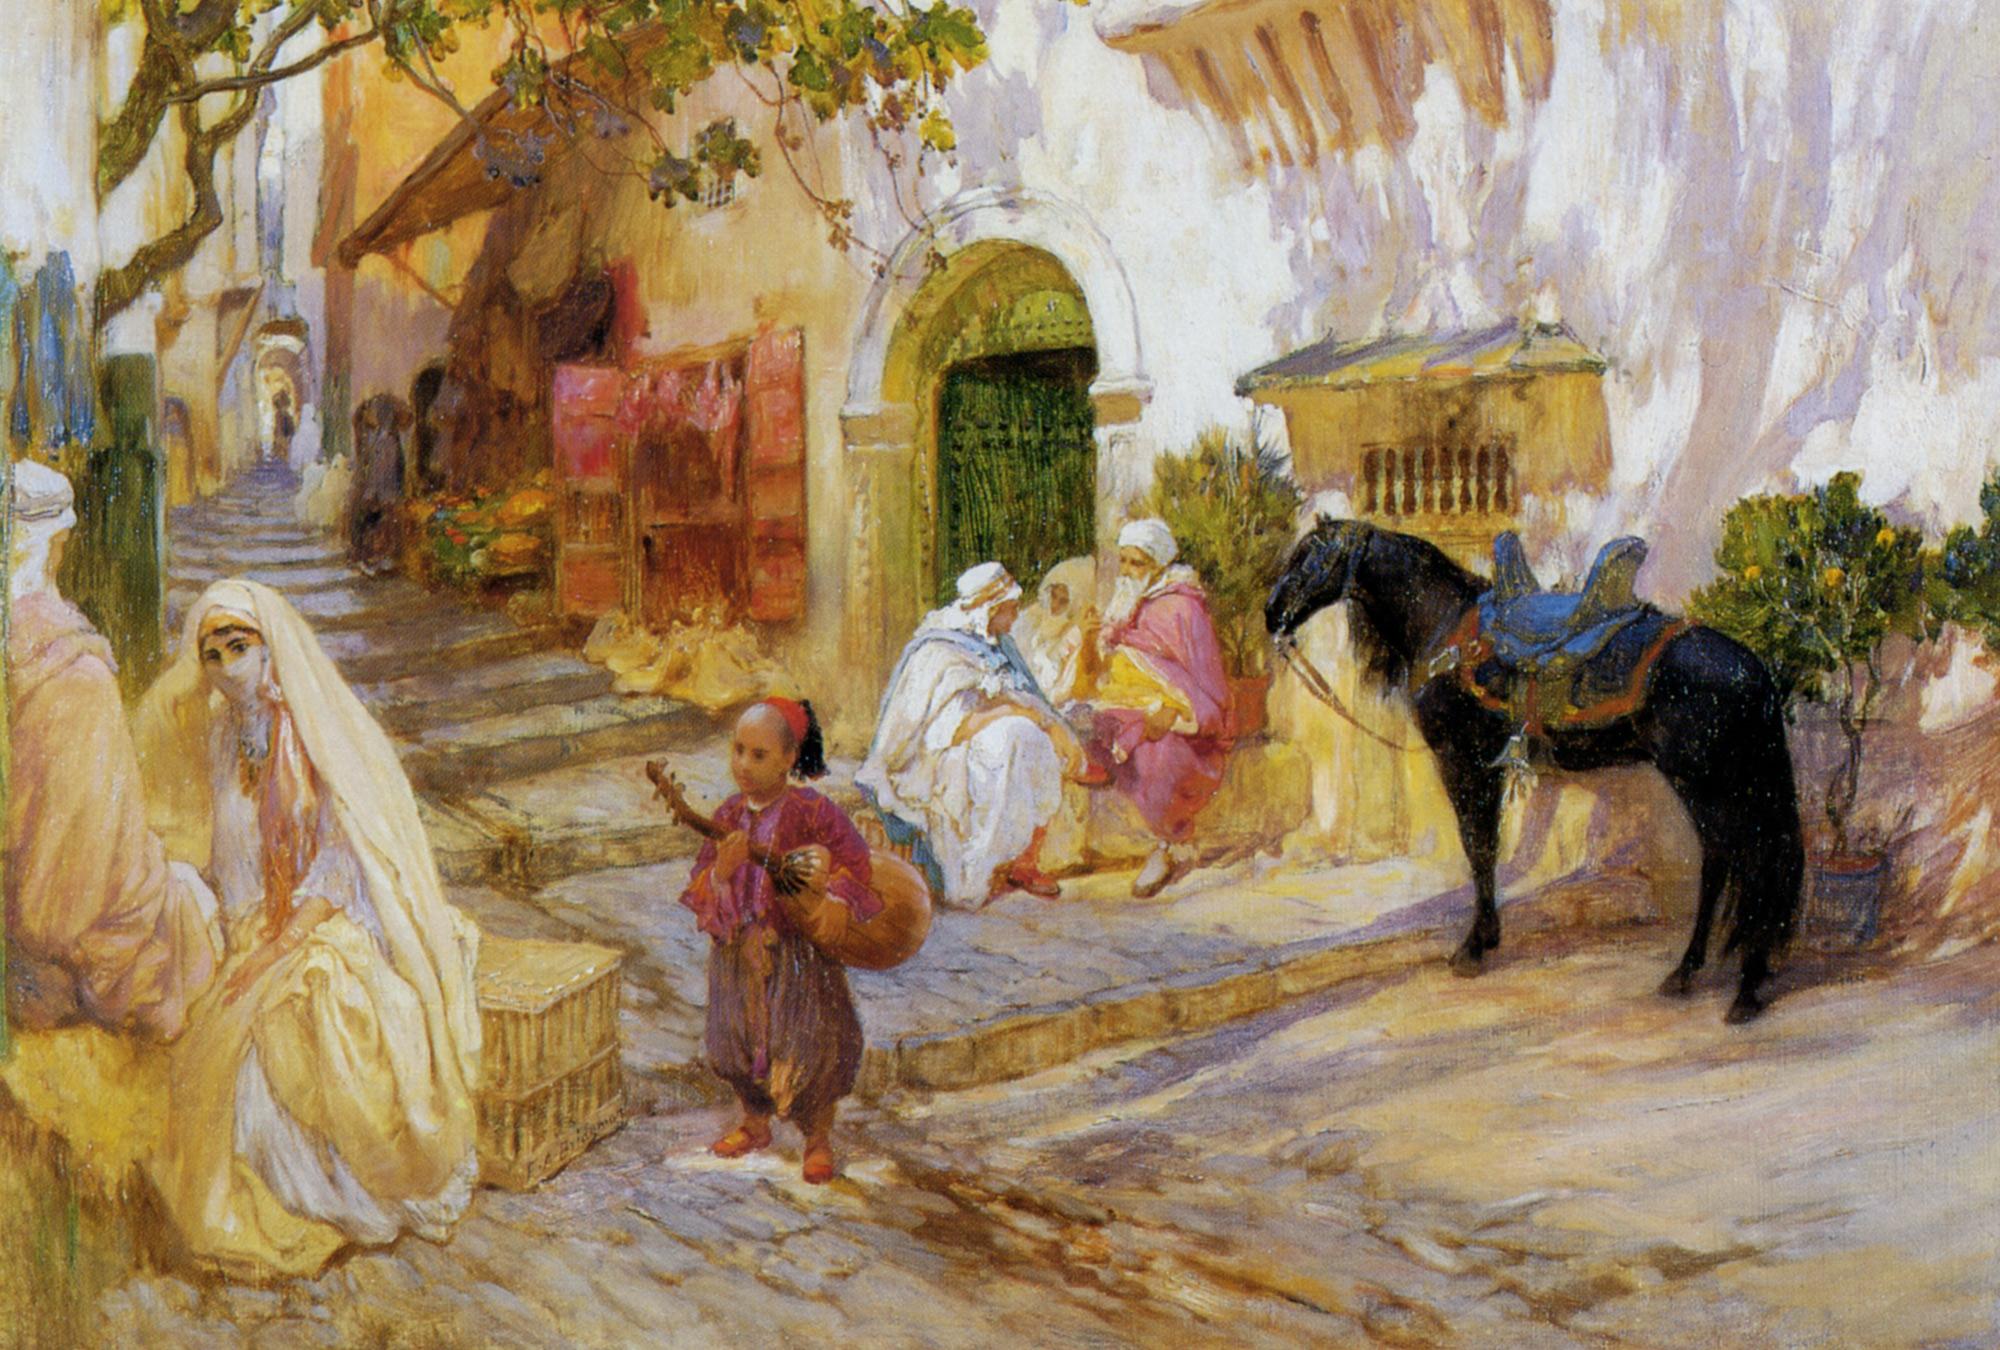 An Algerian Street :: Frederick Arthur Bridgman - scenes of Oriental life (Orientalism) in art and painting ôîòî